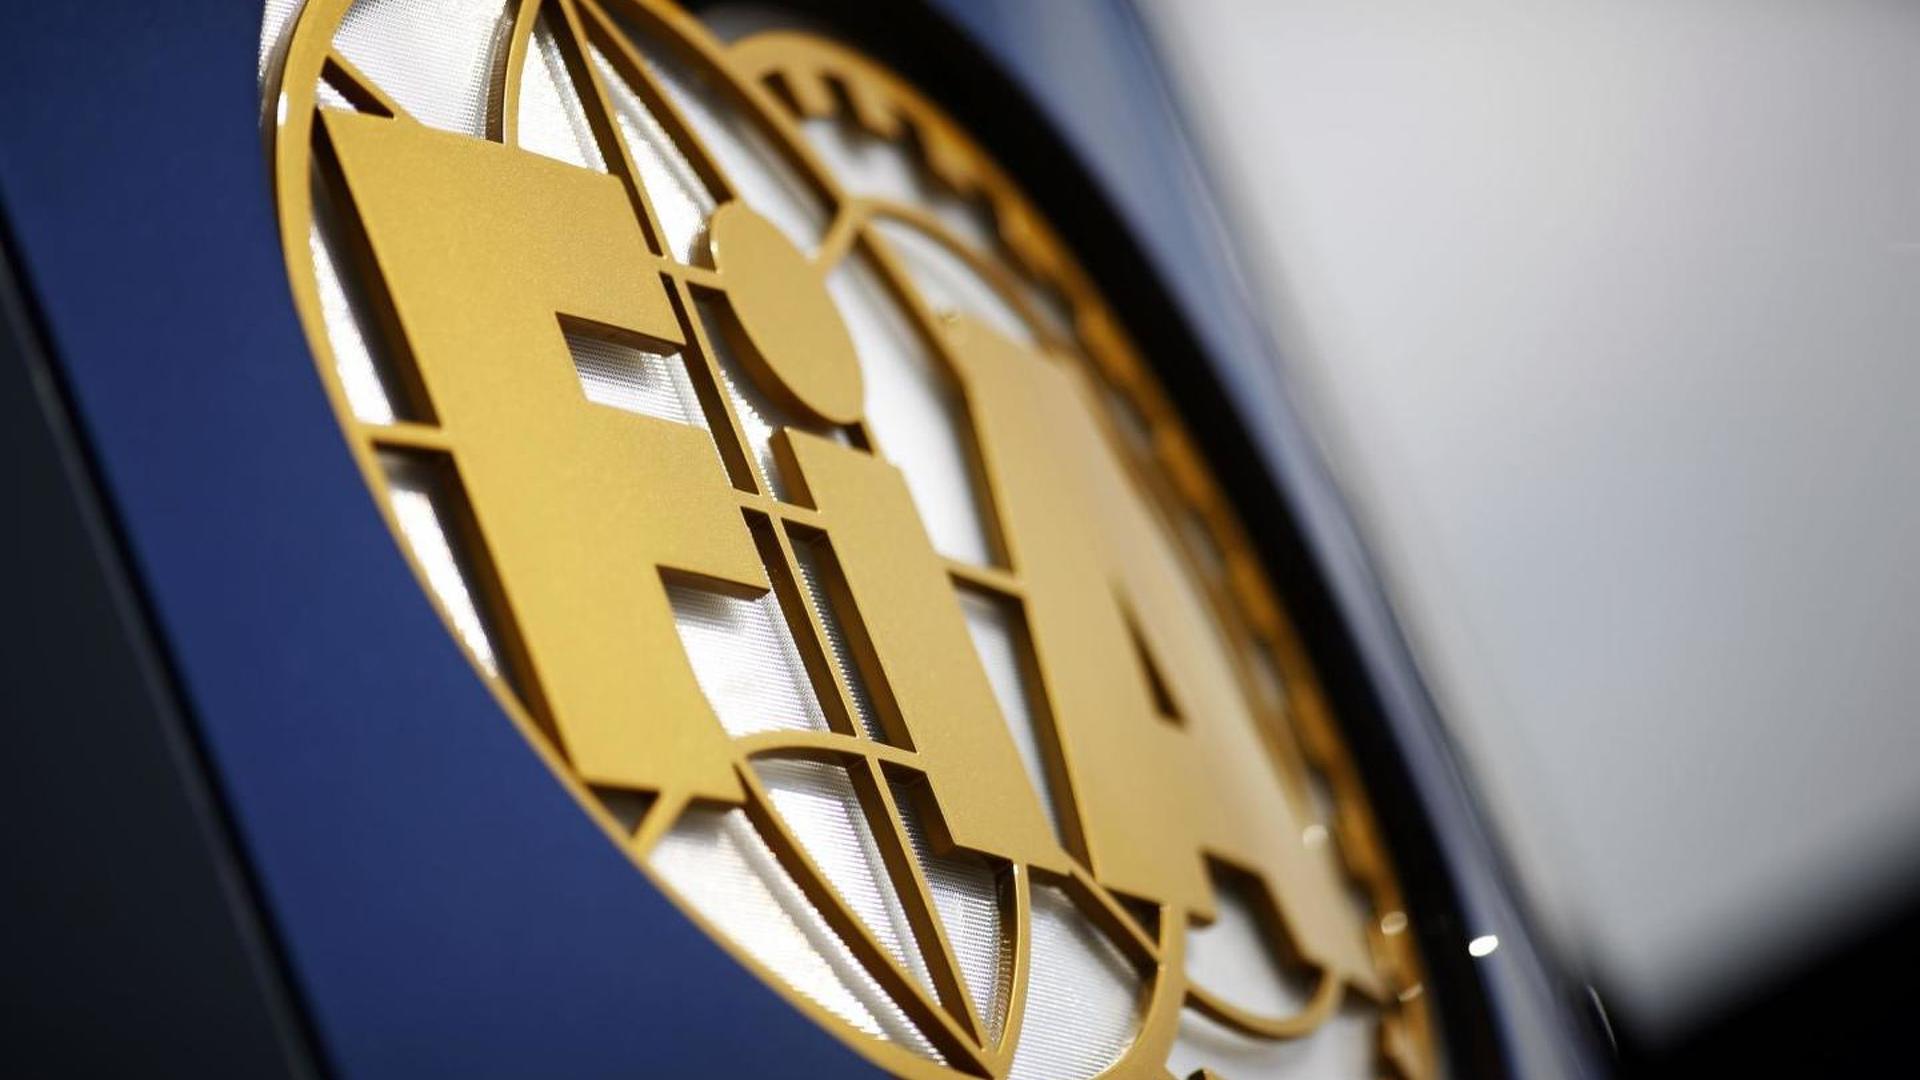 F1 'negativity' to delay floatation plans again